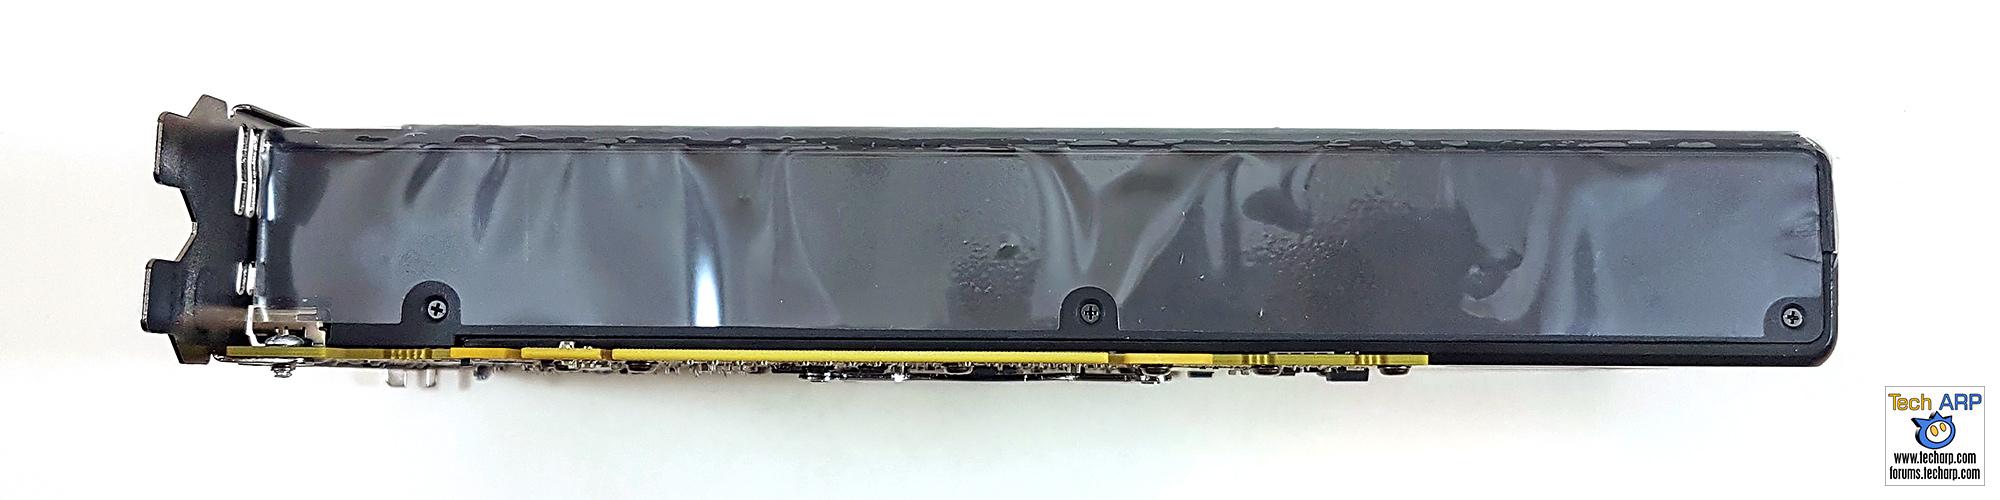 AMD Radeon RX 480 bottom